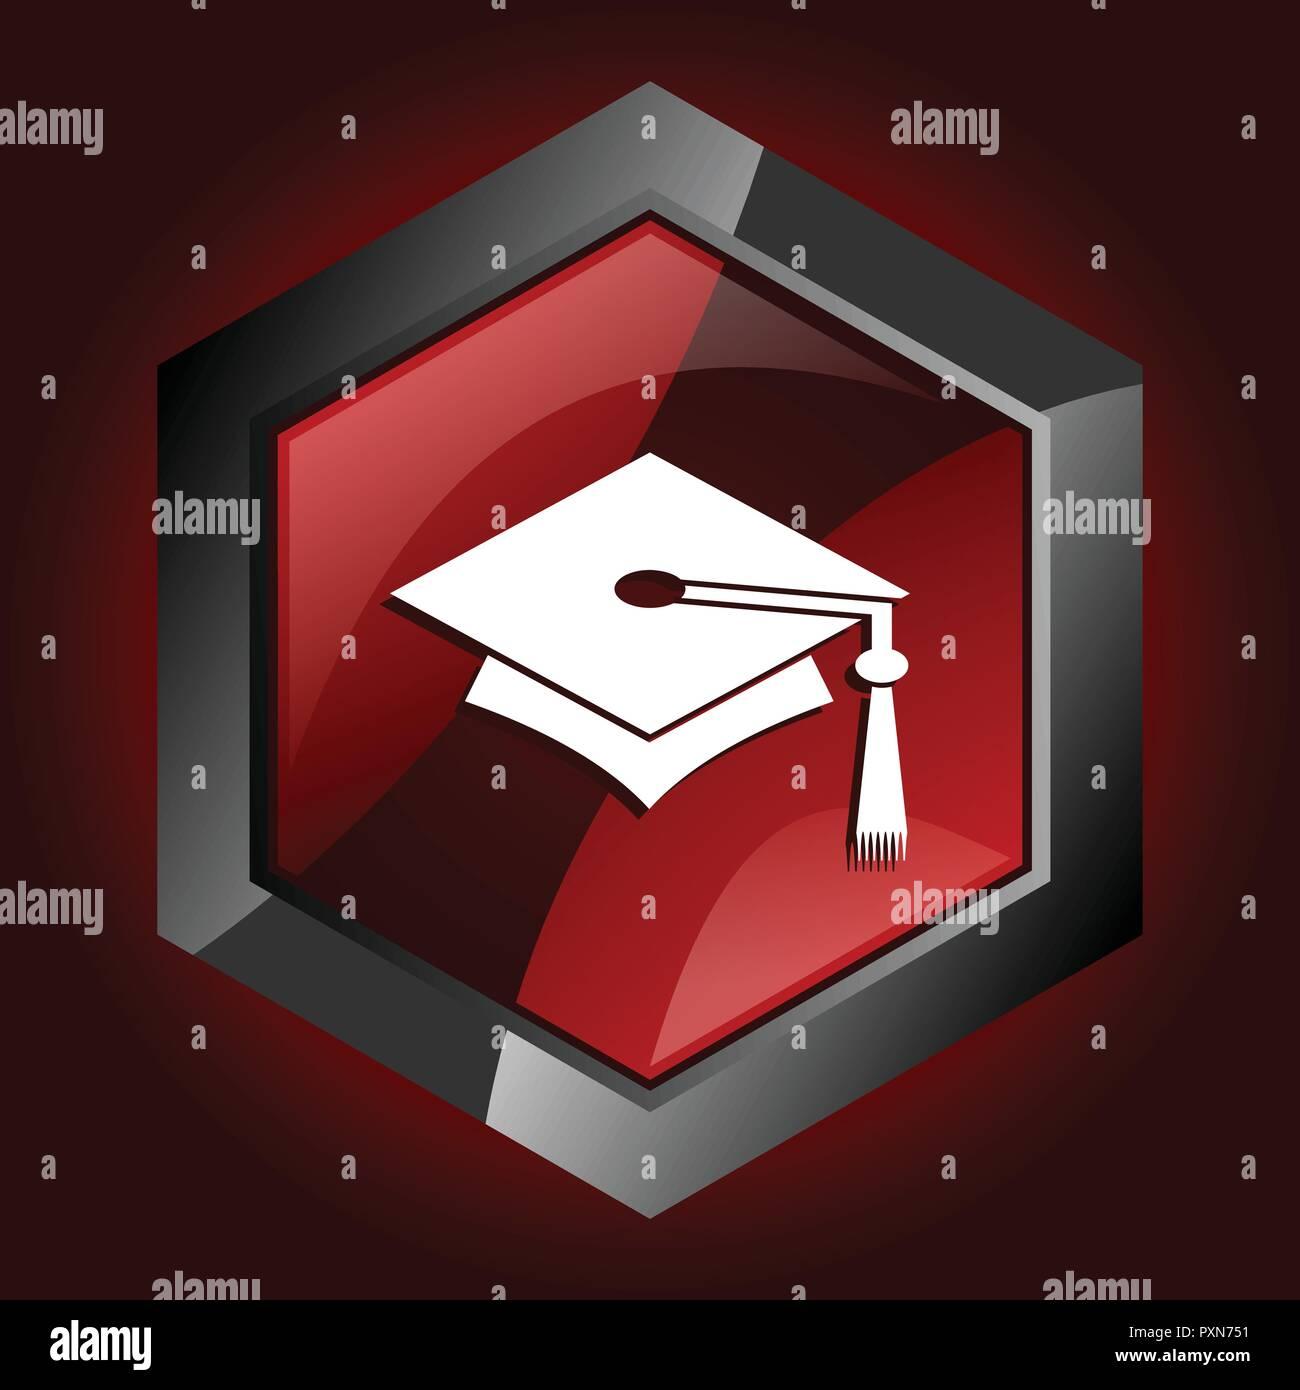 education graduation university degree graduate hexagon dark red vector icon - Stock Image